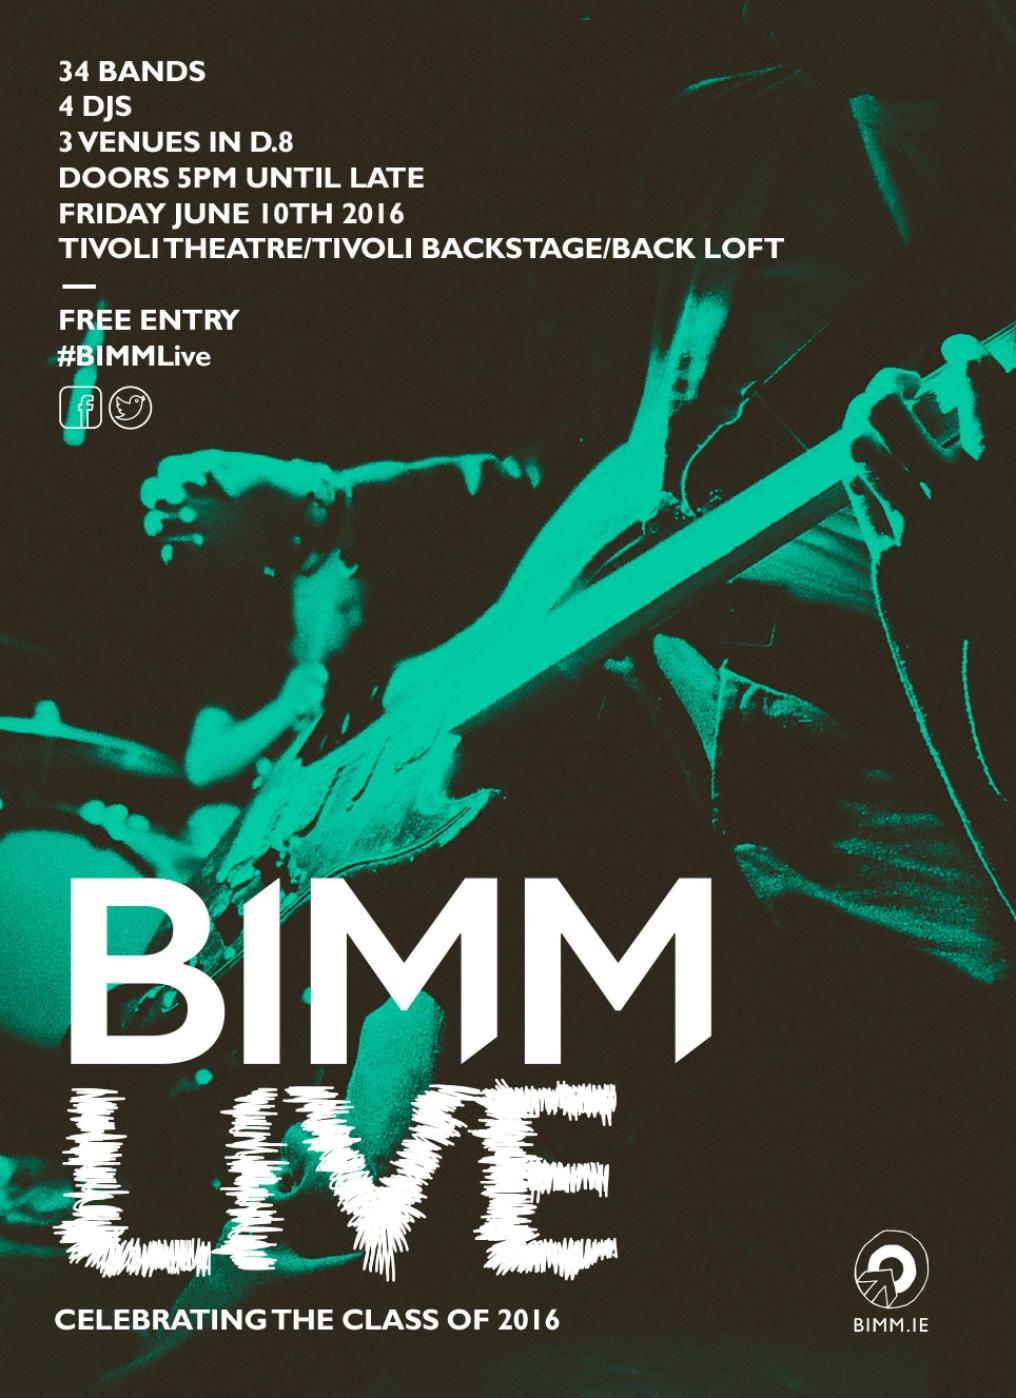 BIMM Live